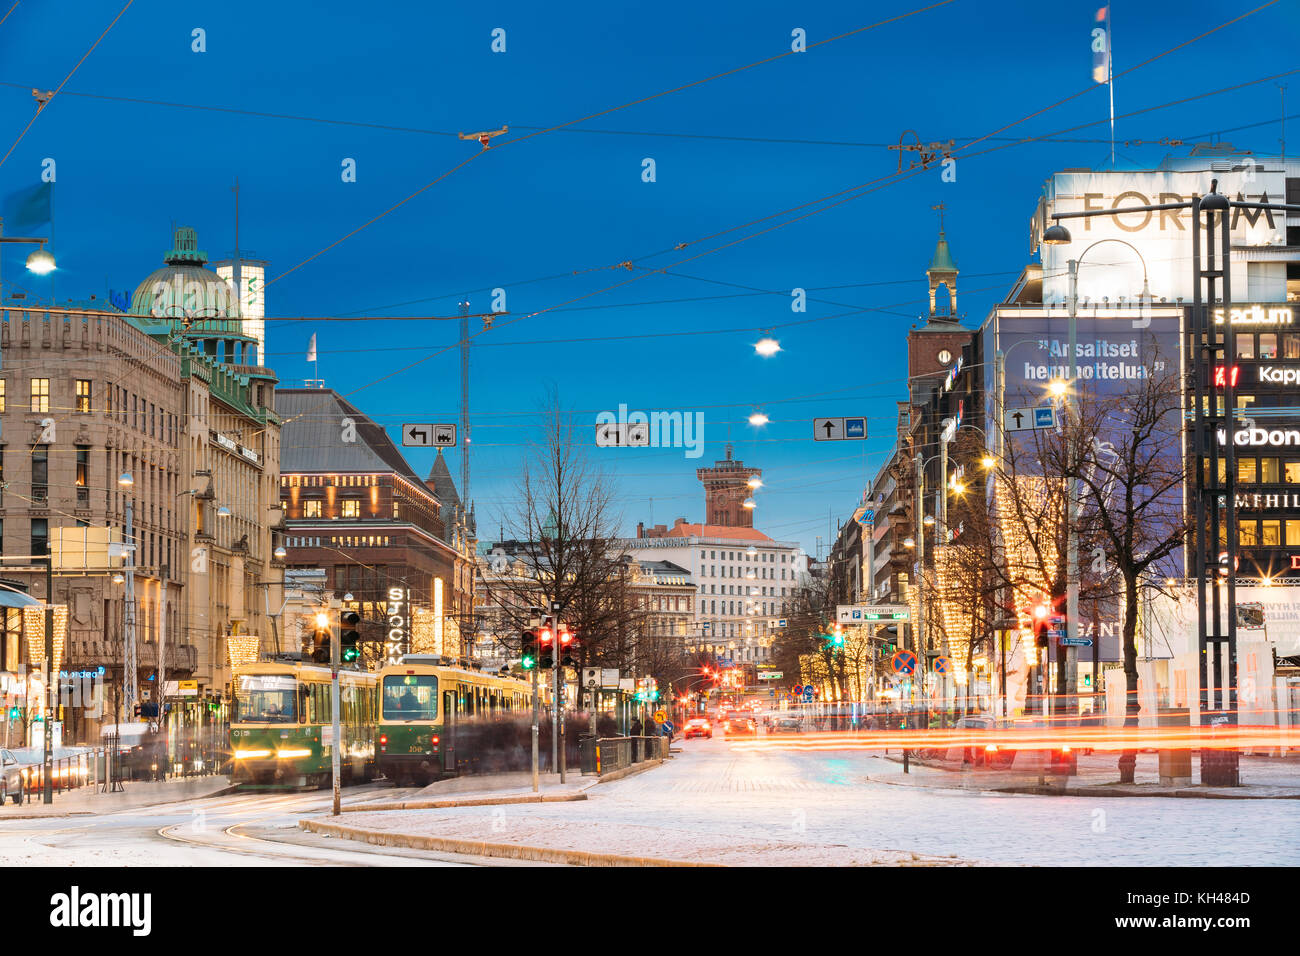 Helsinki, Finland - December 7, 2016: Tram Departs From A Stop On Mannerheim Avenue In Helsinki. Night View Of Mannerheim - Stock Image